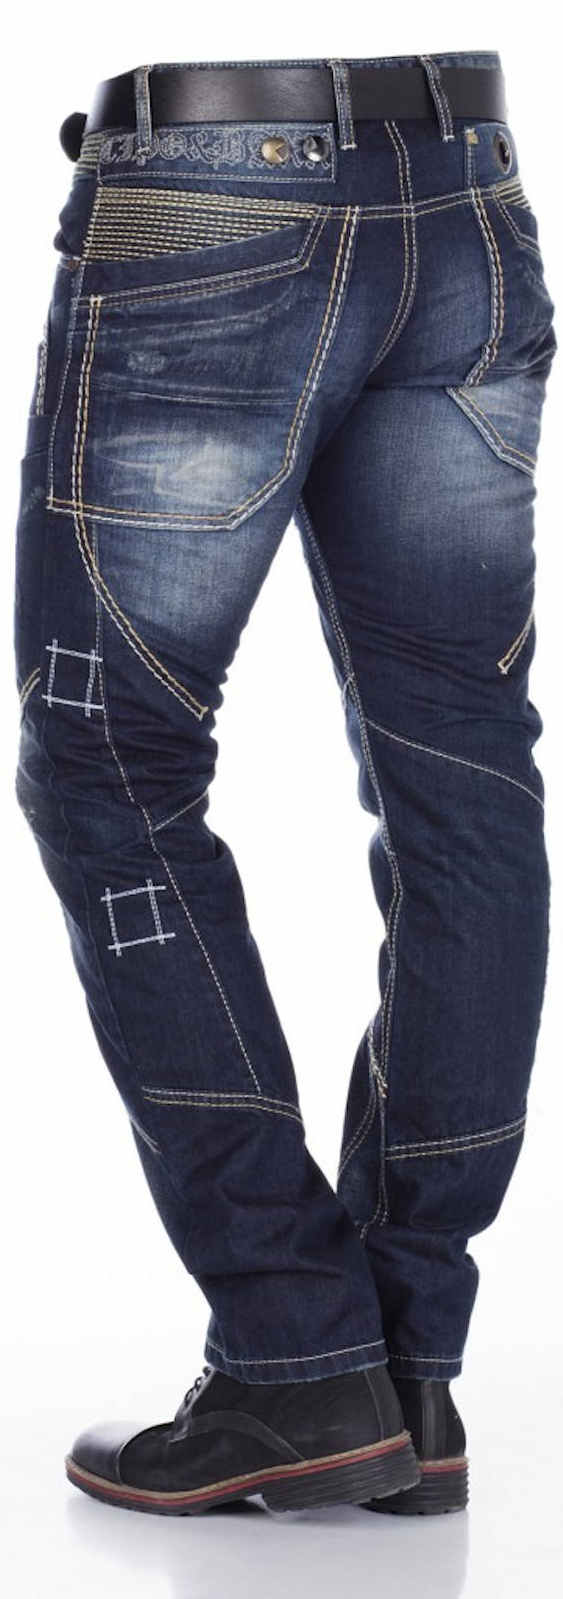 Cipo-amp-Baxx-Men-039-s-Jeans-c-1114-New-Trousers-Straight-Cut-Regular-Straight-Leg-Denim thumbnail 5